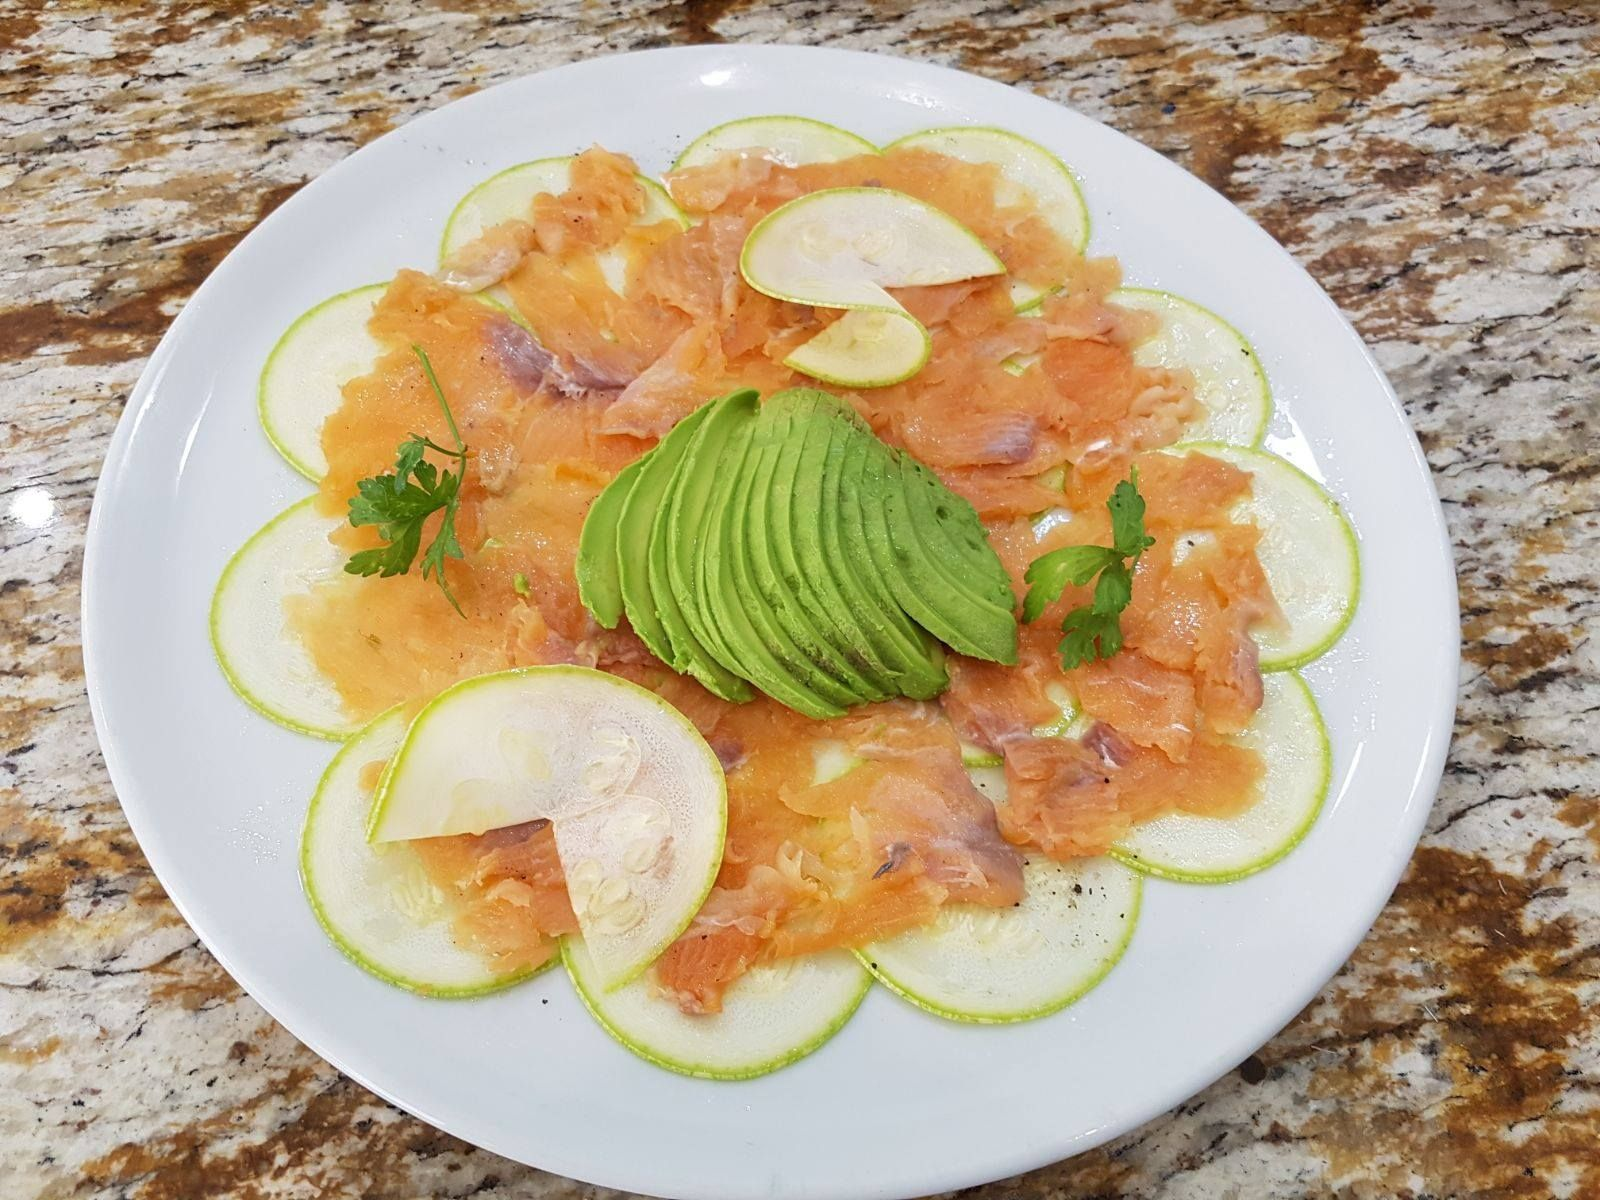 Carpaccio sabroso con salmón, aguacate, calabacín, limón y aceite